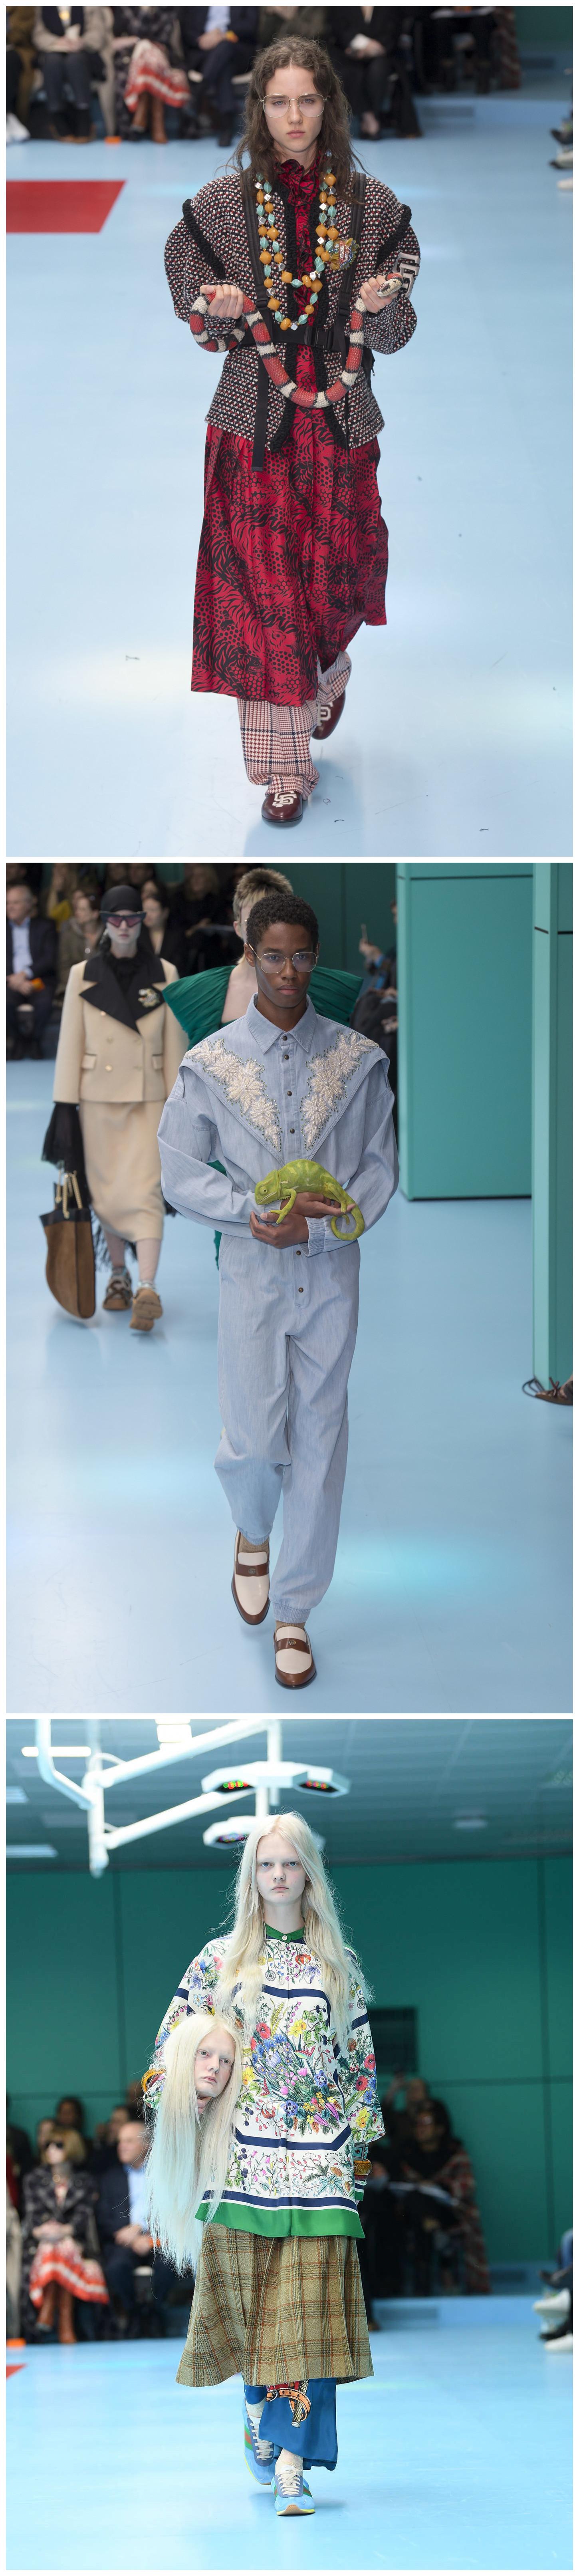 "wholesale dealer 47f1b de22e 秀场变成手术间,Gucci让模特抱着自己的""人头""走秀| 第一财经杂志"